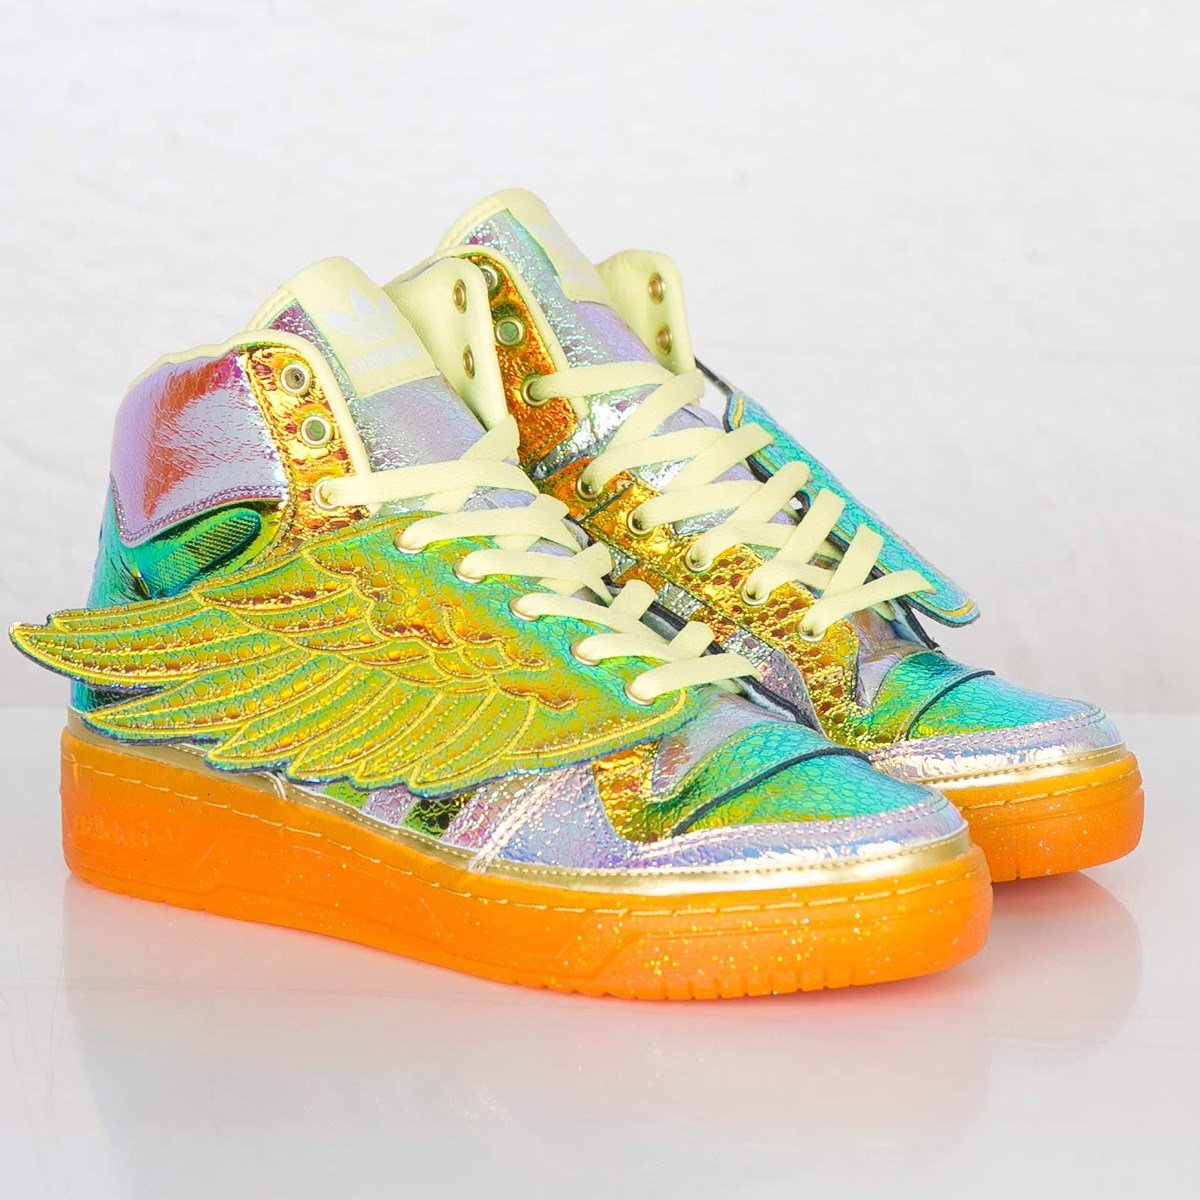 bbe9a52f6732 adidas JS Foil Wing - D65203 - Sneakersnstuff